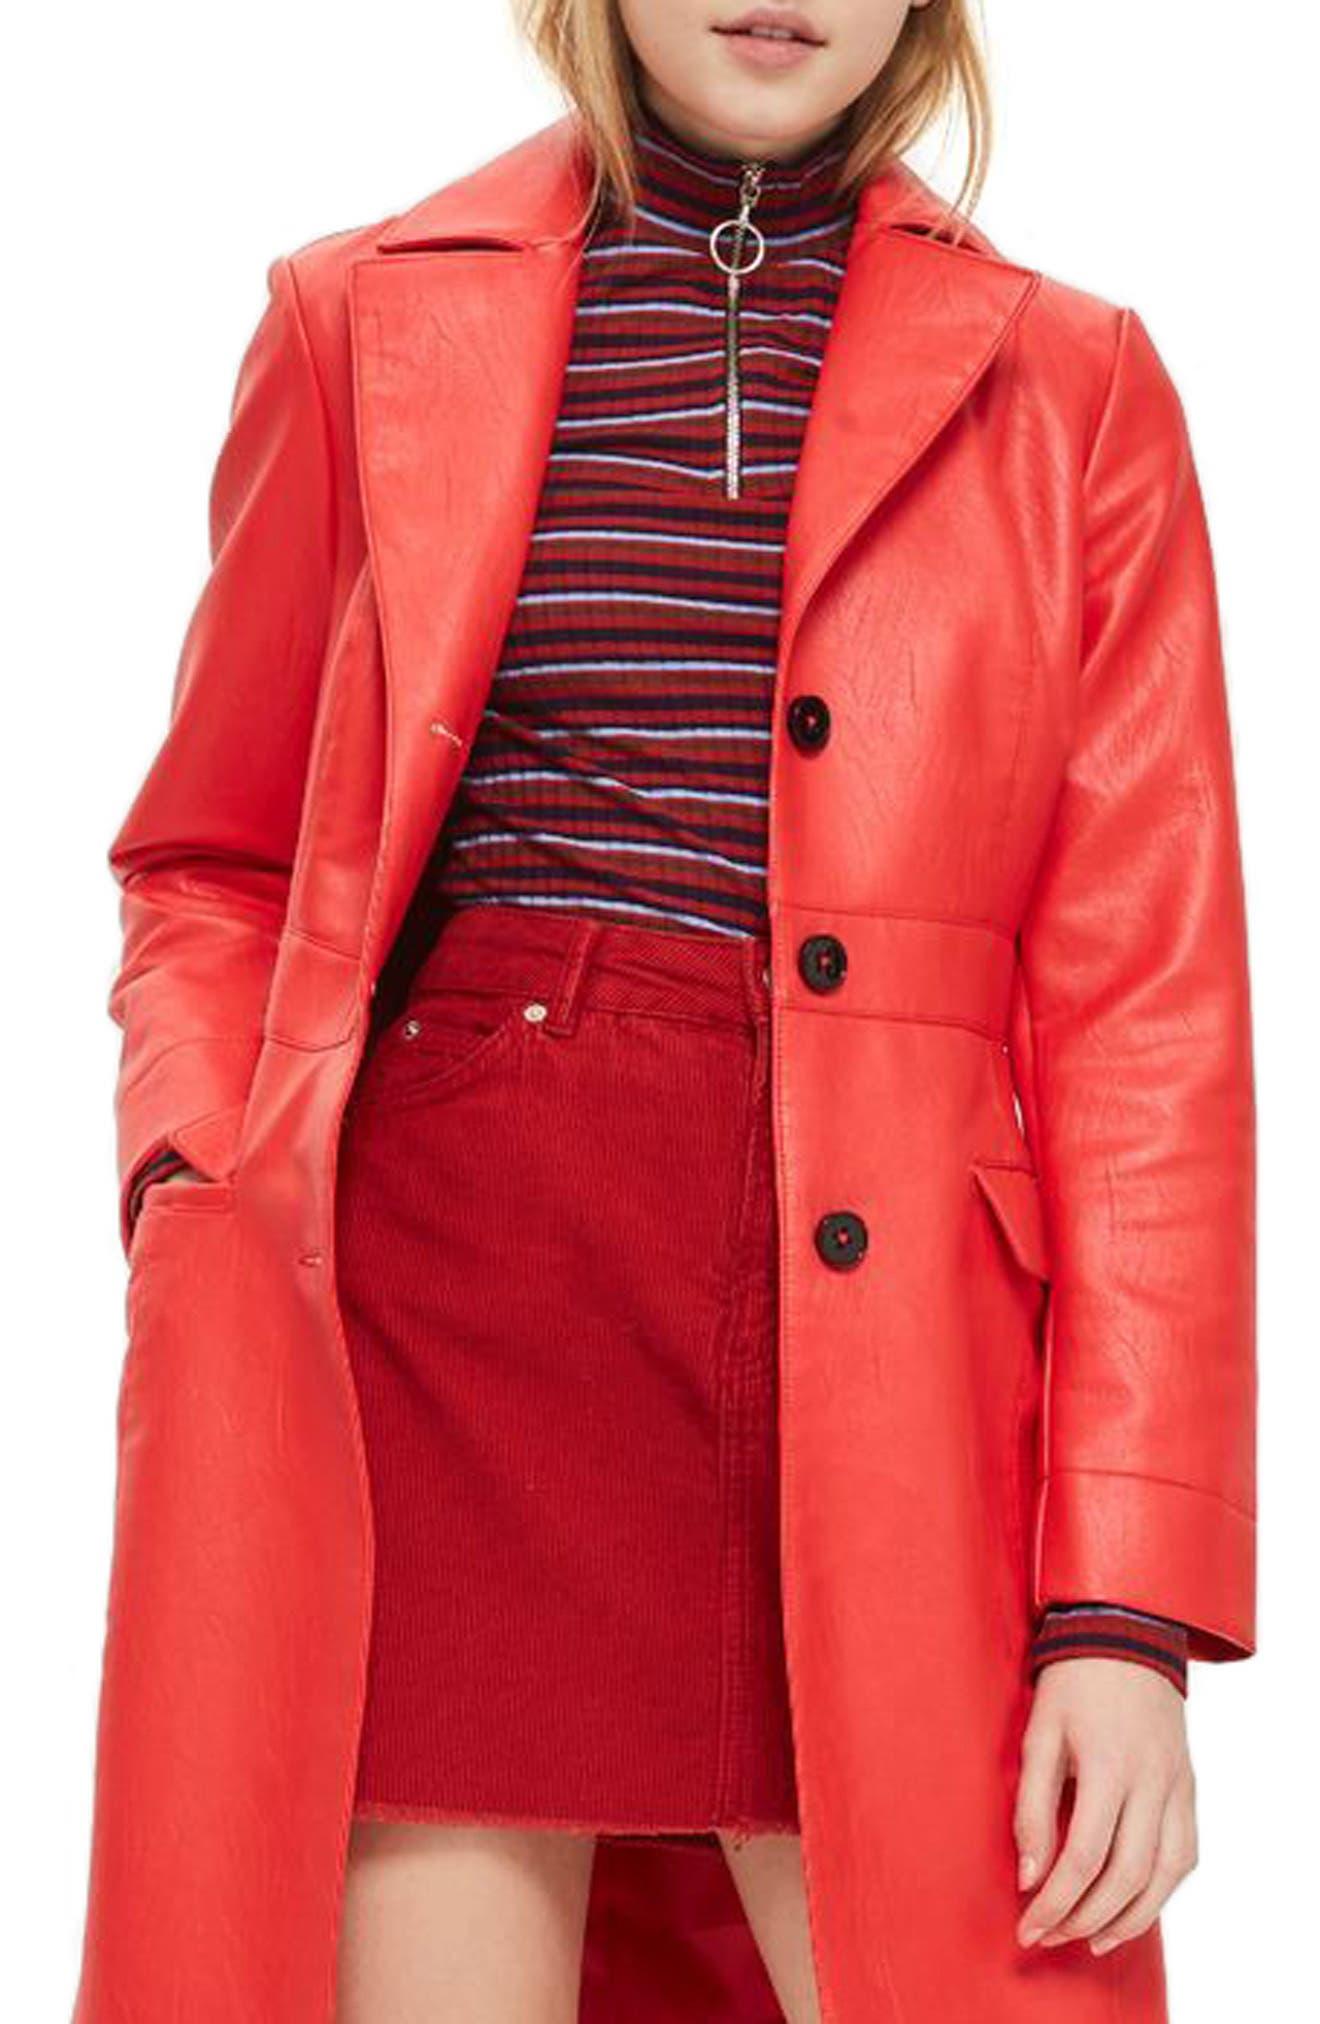 Quarter Zip Mock Neck Sweater,                         Main,                         color, Red Multi